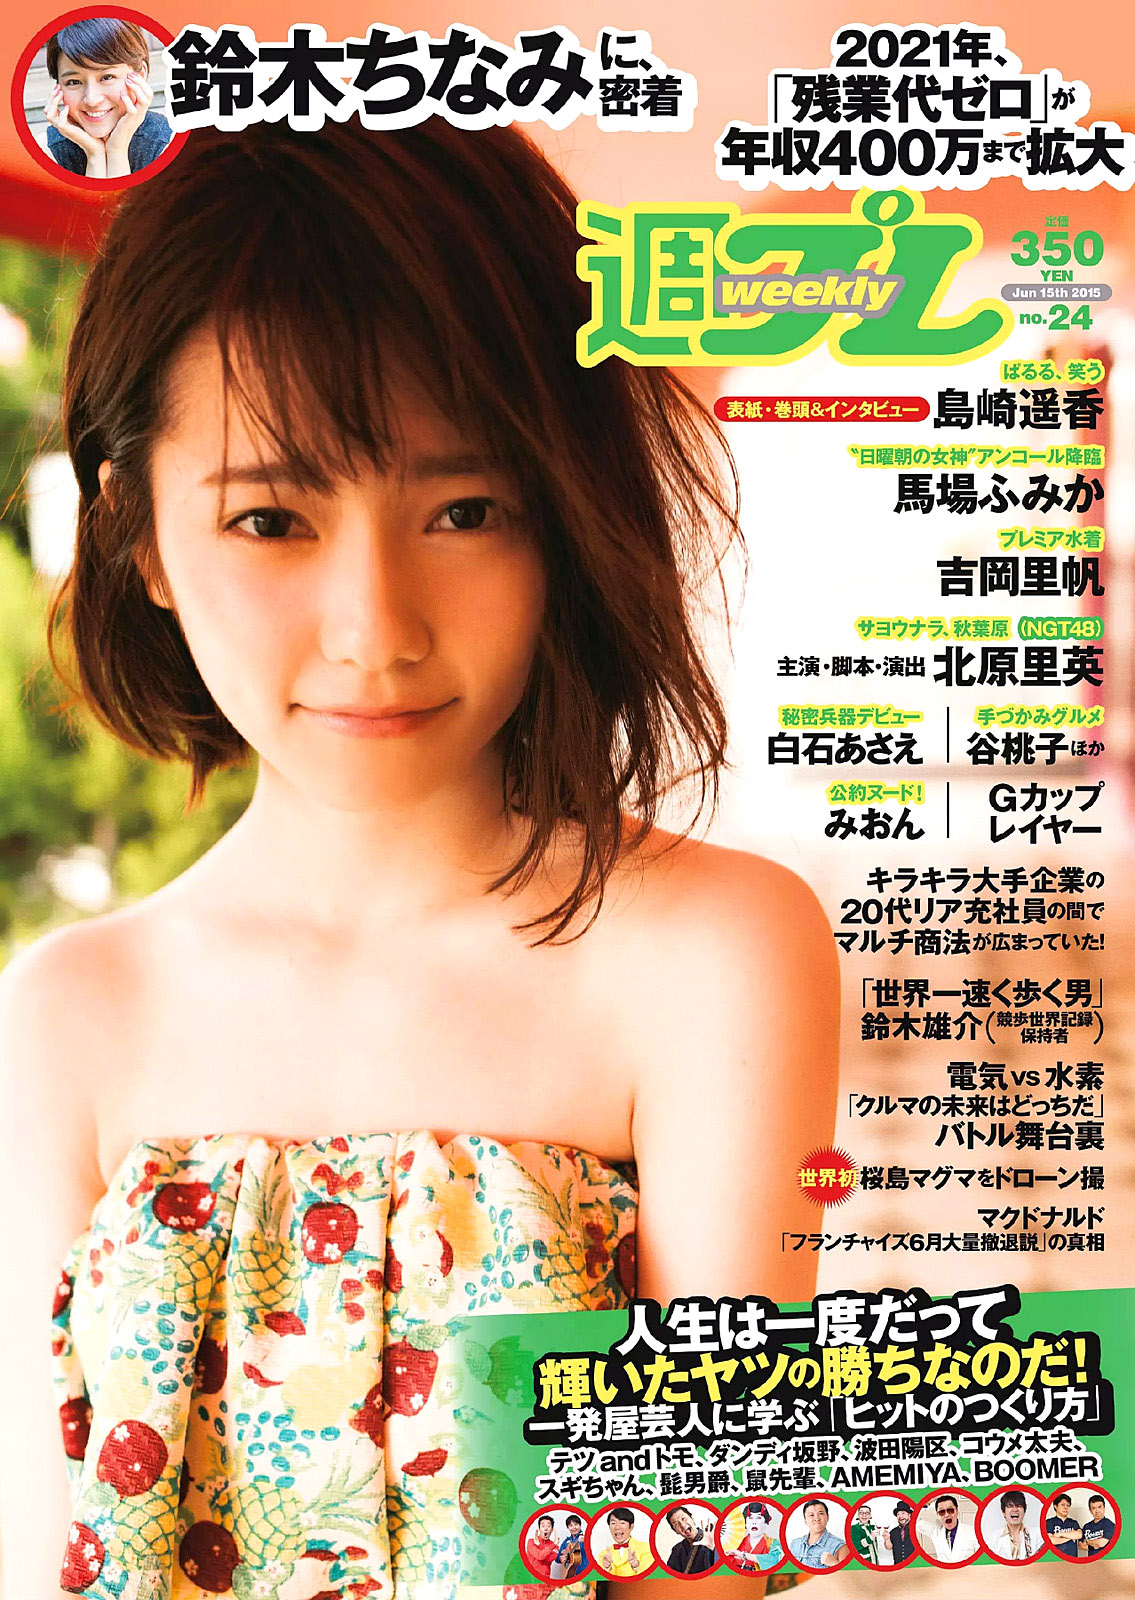 HShimazaki WPB 150615 01.jpg